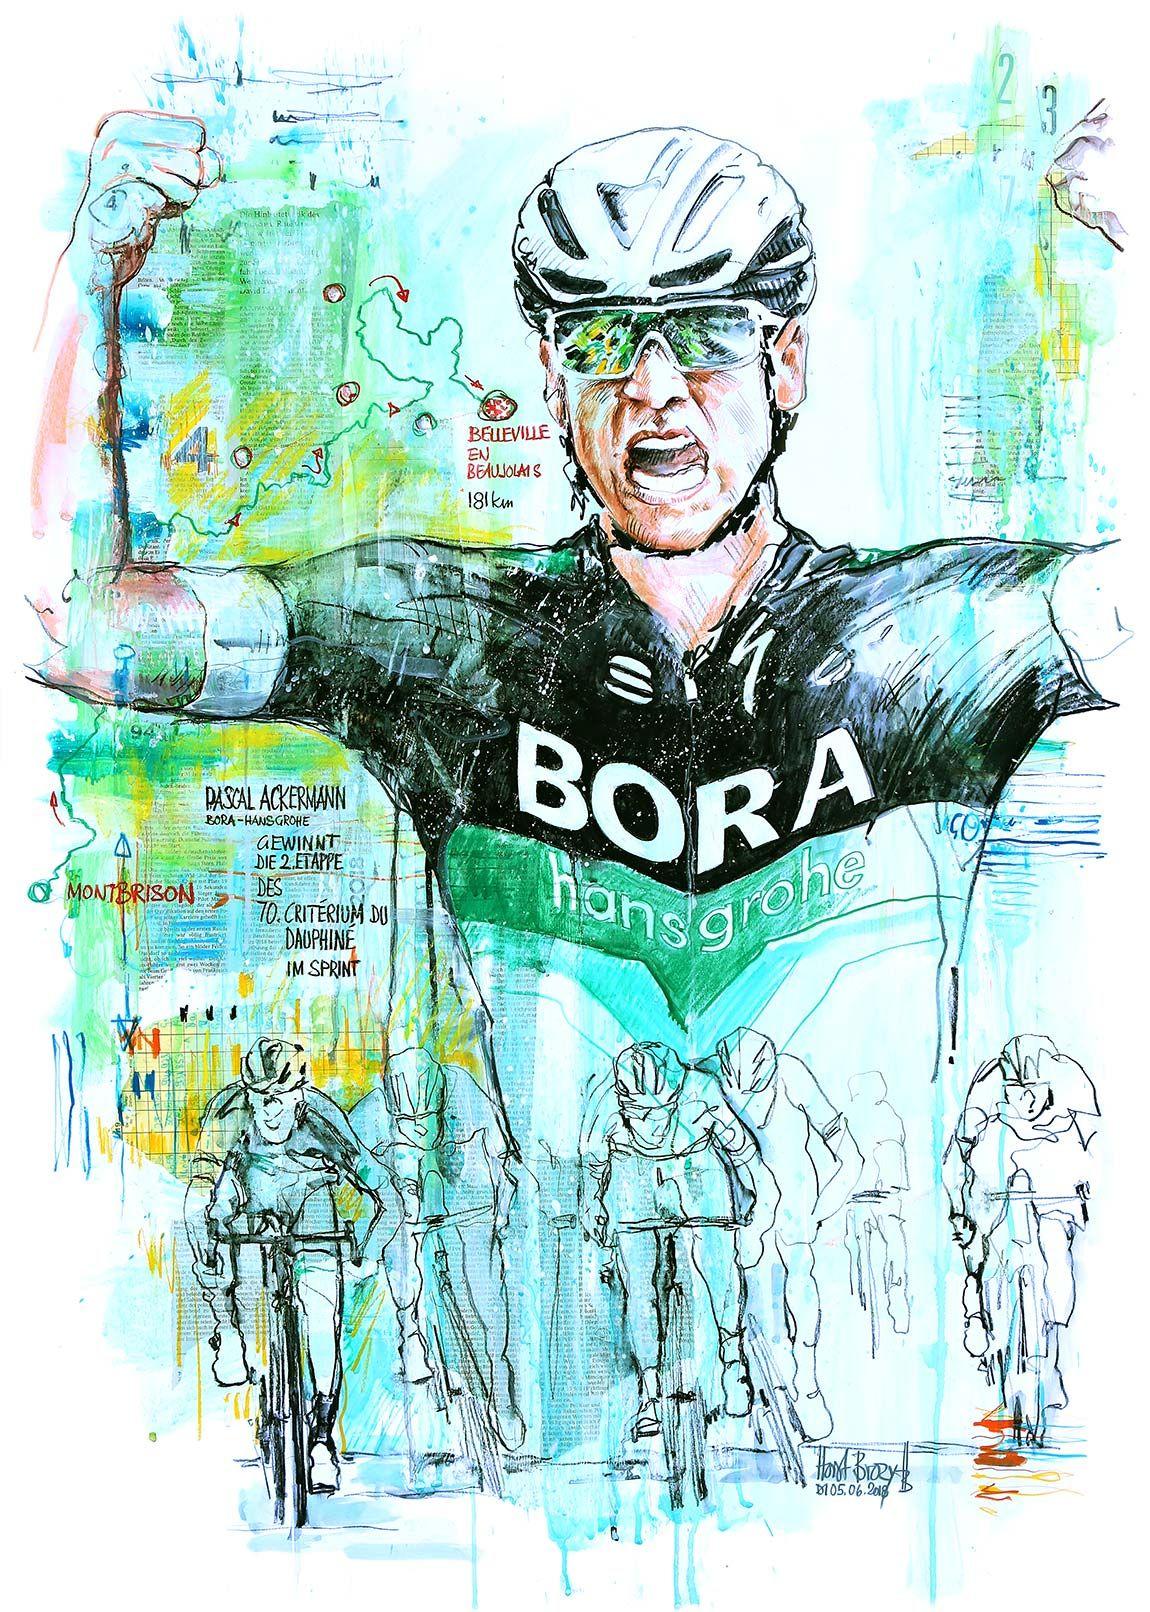 Pascal Ackermann Bora Hansgrohe Gewinnt Die 2 Etappe Des 70